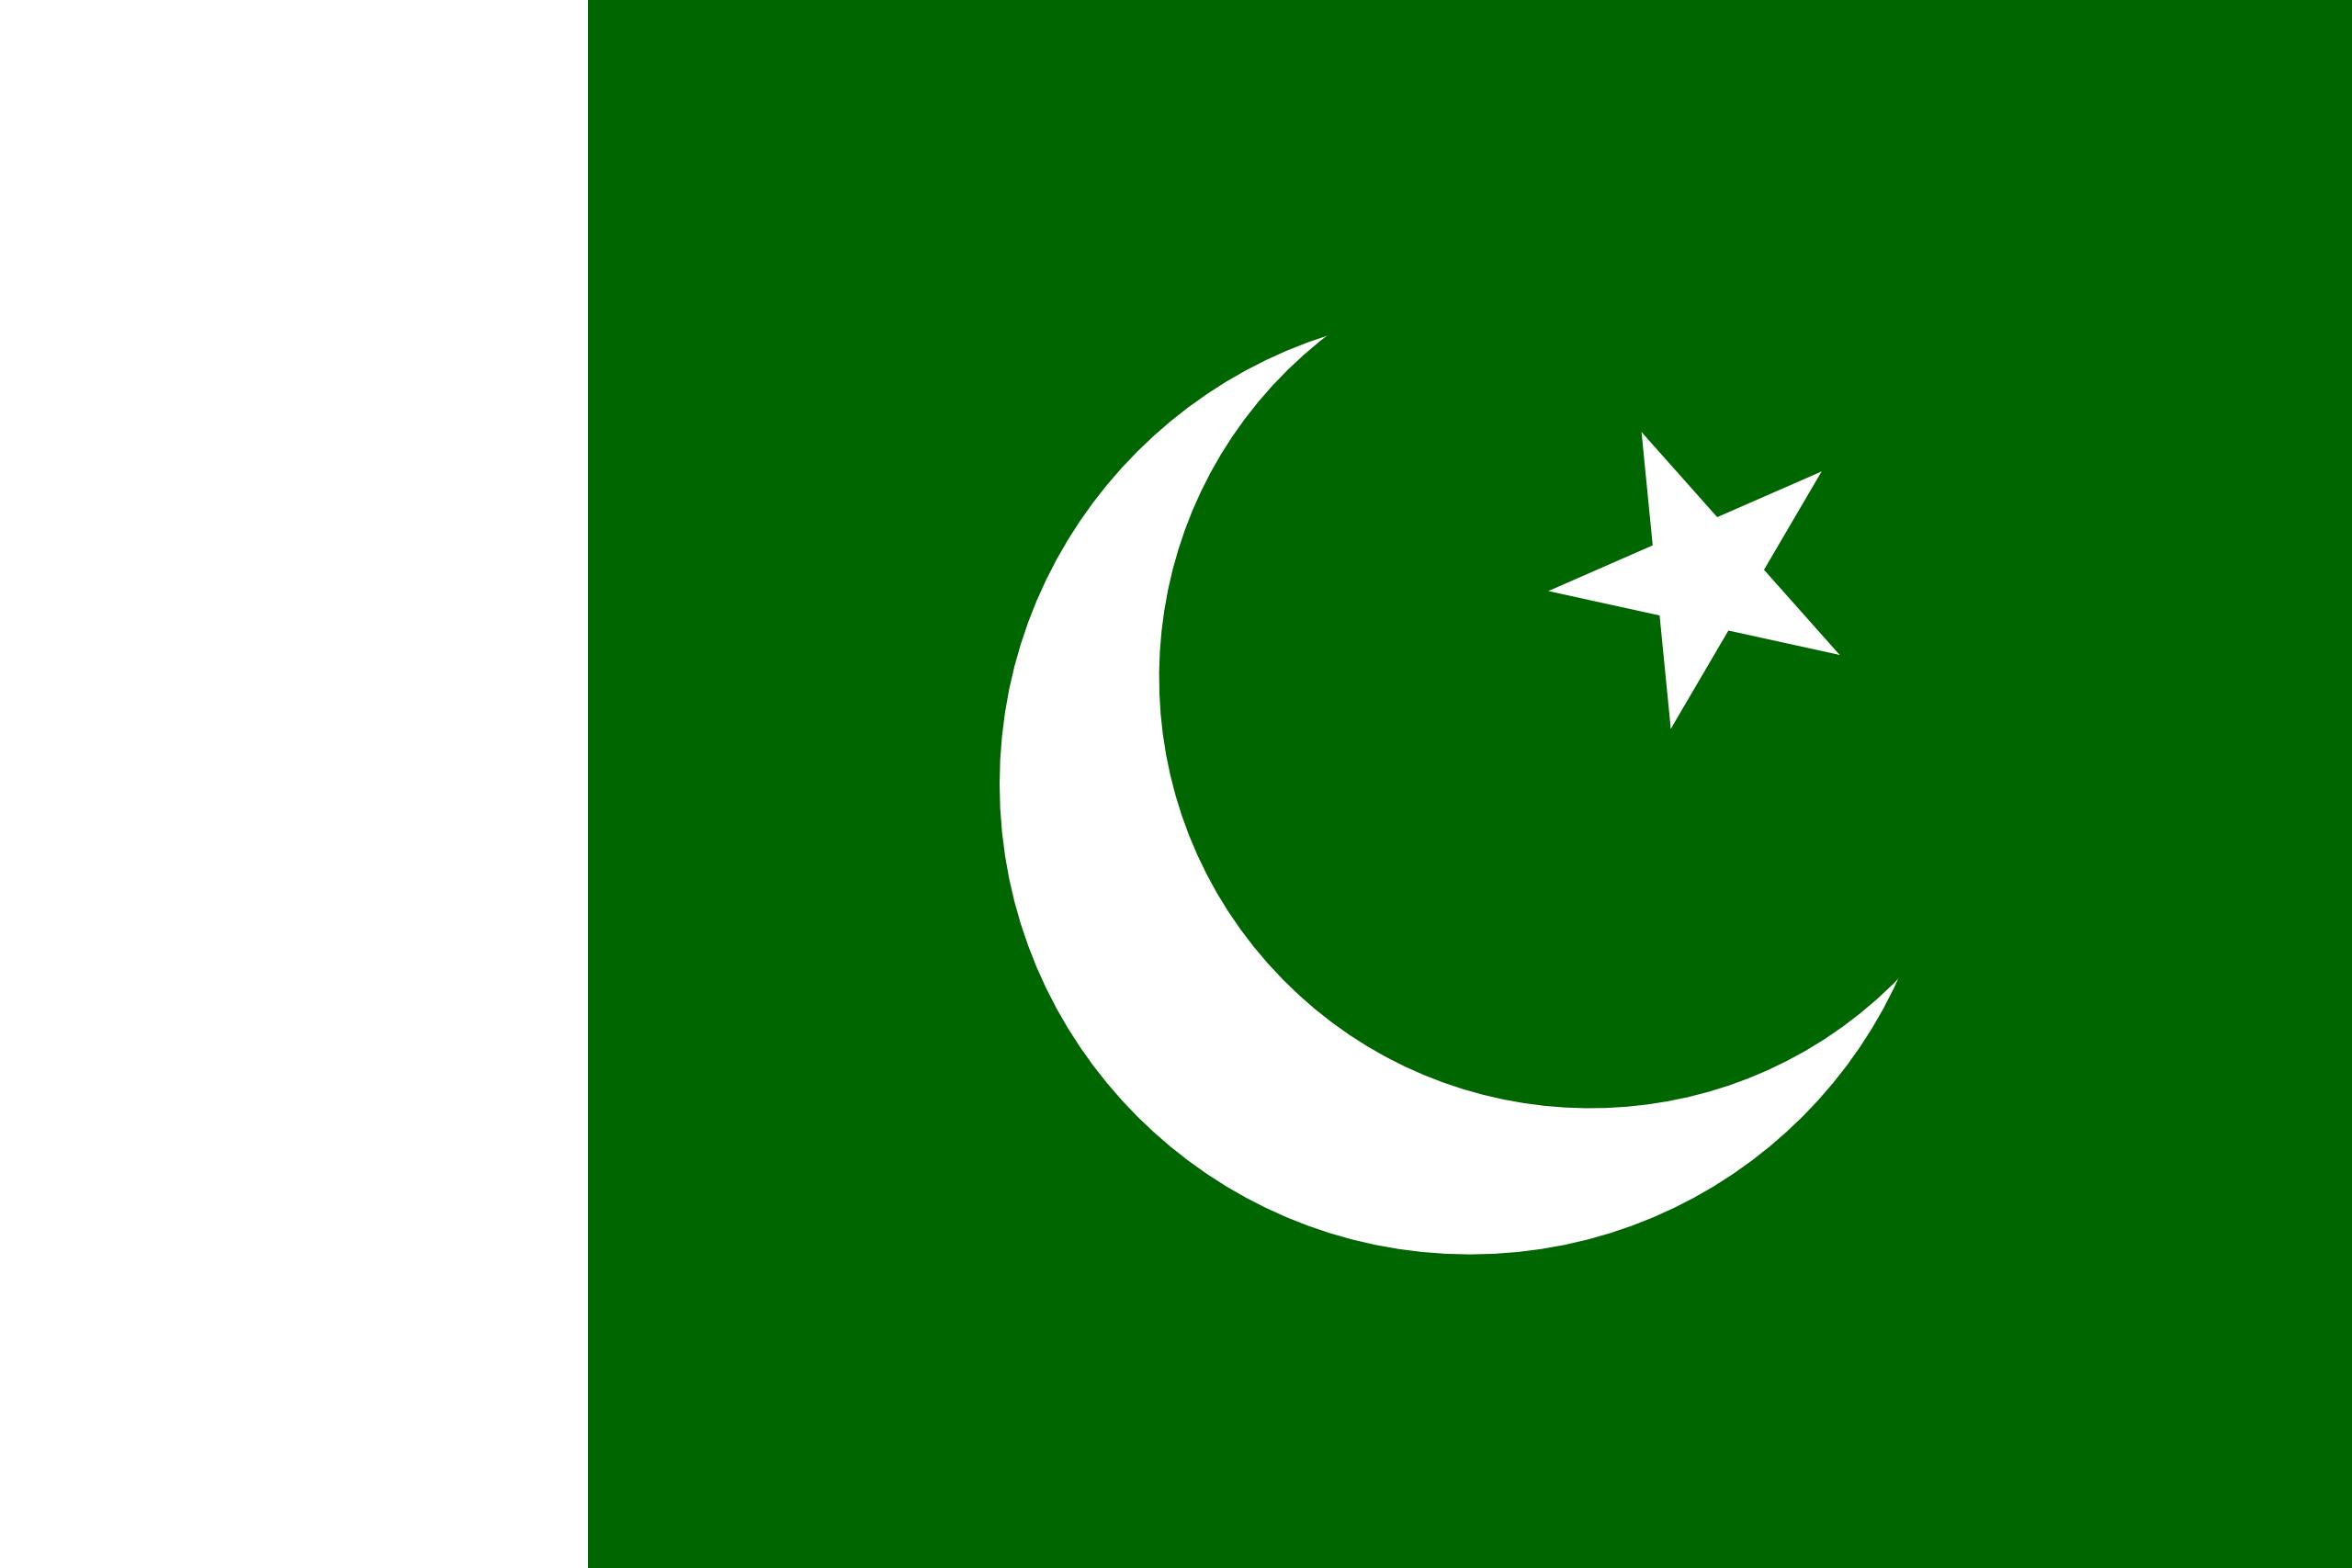 pakistán, Land, Emblem, Logo, Symbol - Wallpaper HD - Prof.-falken.com